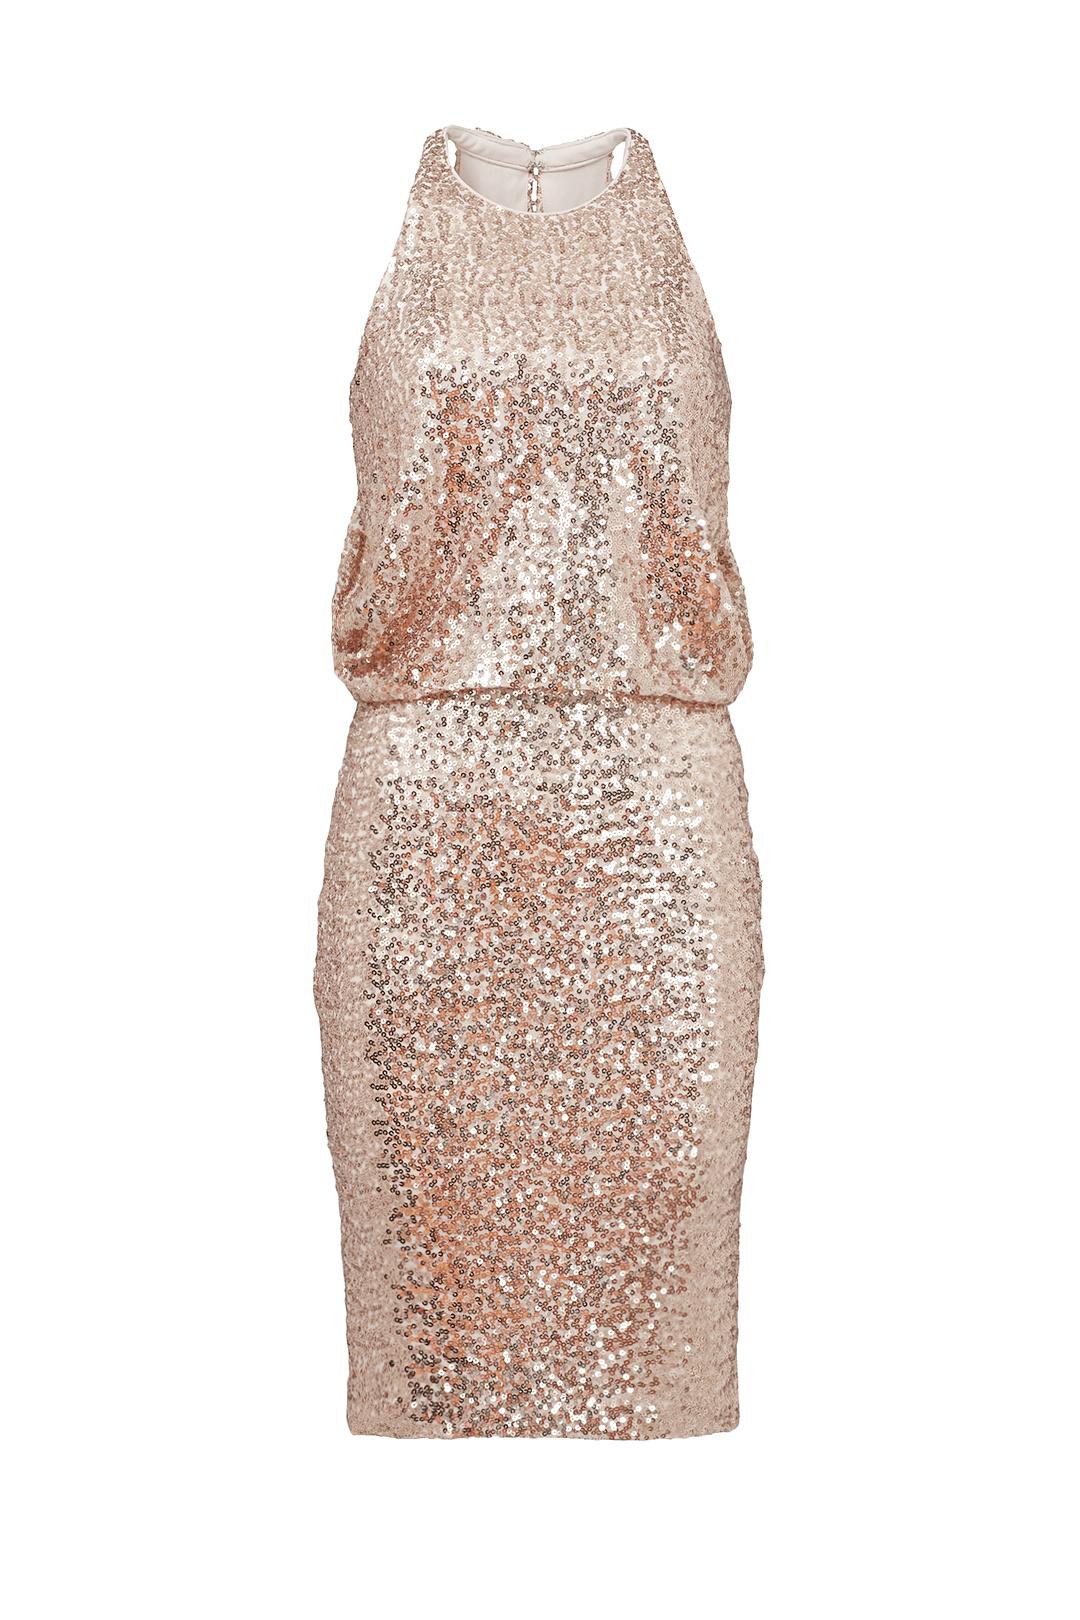 Gold Sequined Dress.jpg